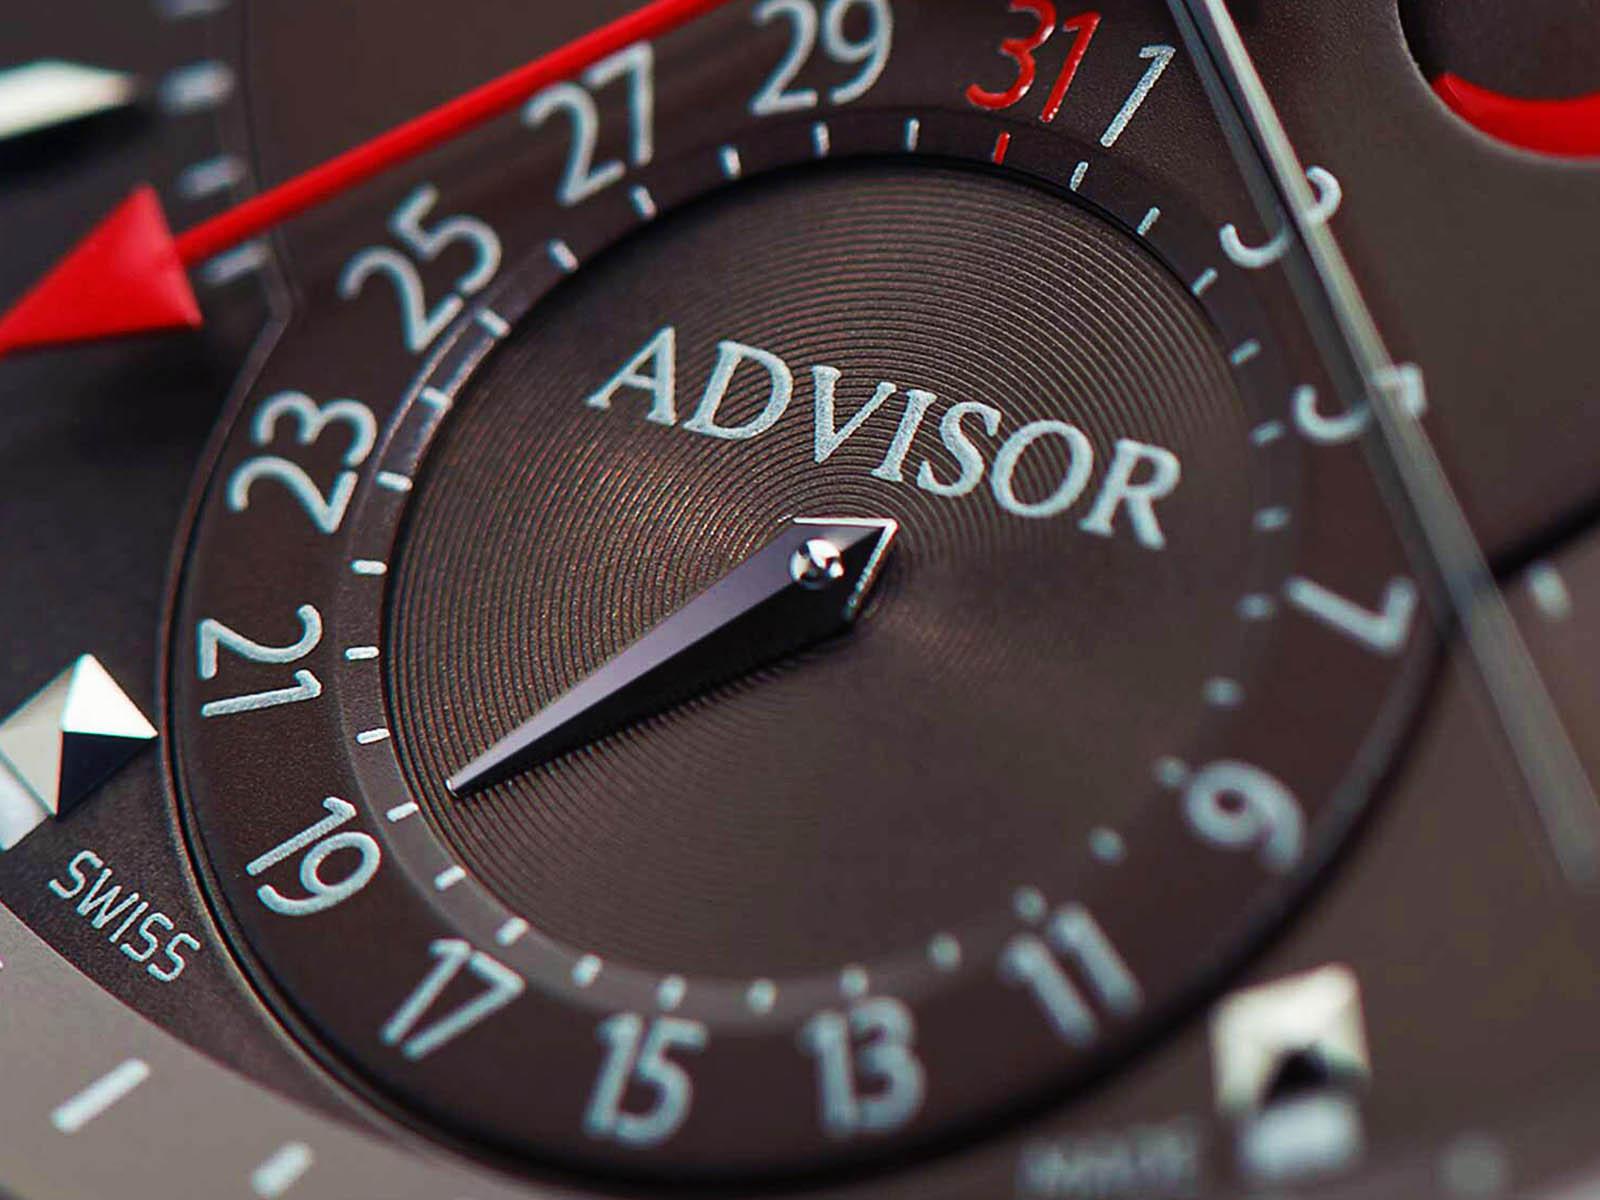 mechanical-alarm-watches-tudor-heritage-advisor-2.jpg